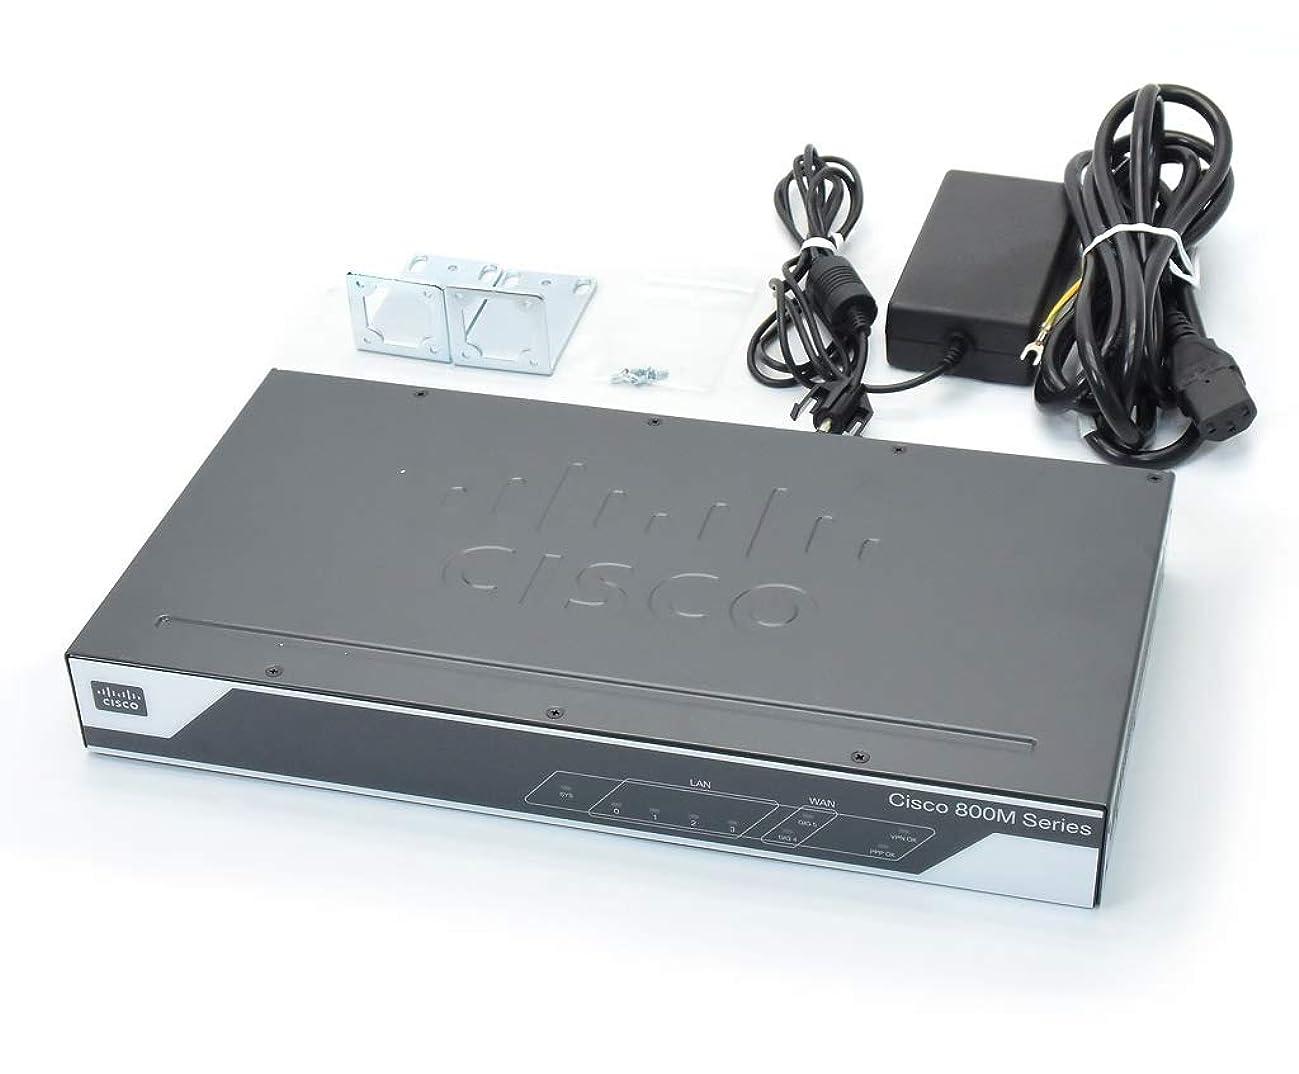 【中古】 Cisco C841M-4X-JAIS/K9 V01 WAN 2ポート1000BASE-T LAN 4ポート1000BASE-T C800M-UNIVERSALK9-M Ver.15.5(3)M 設定初期化済